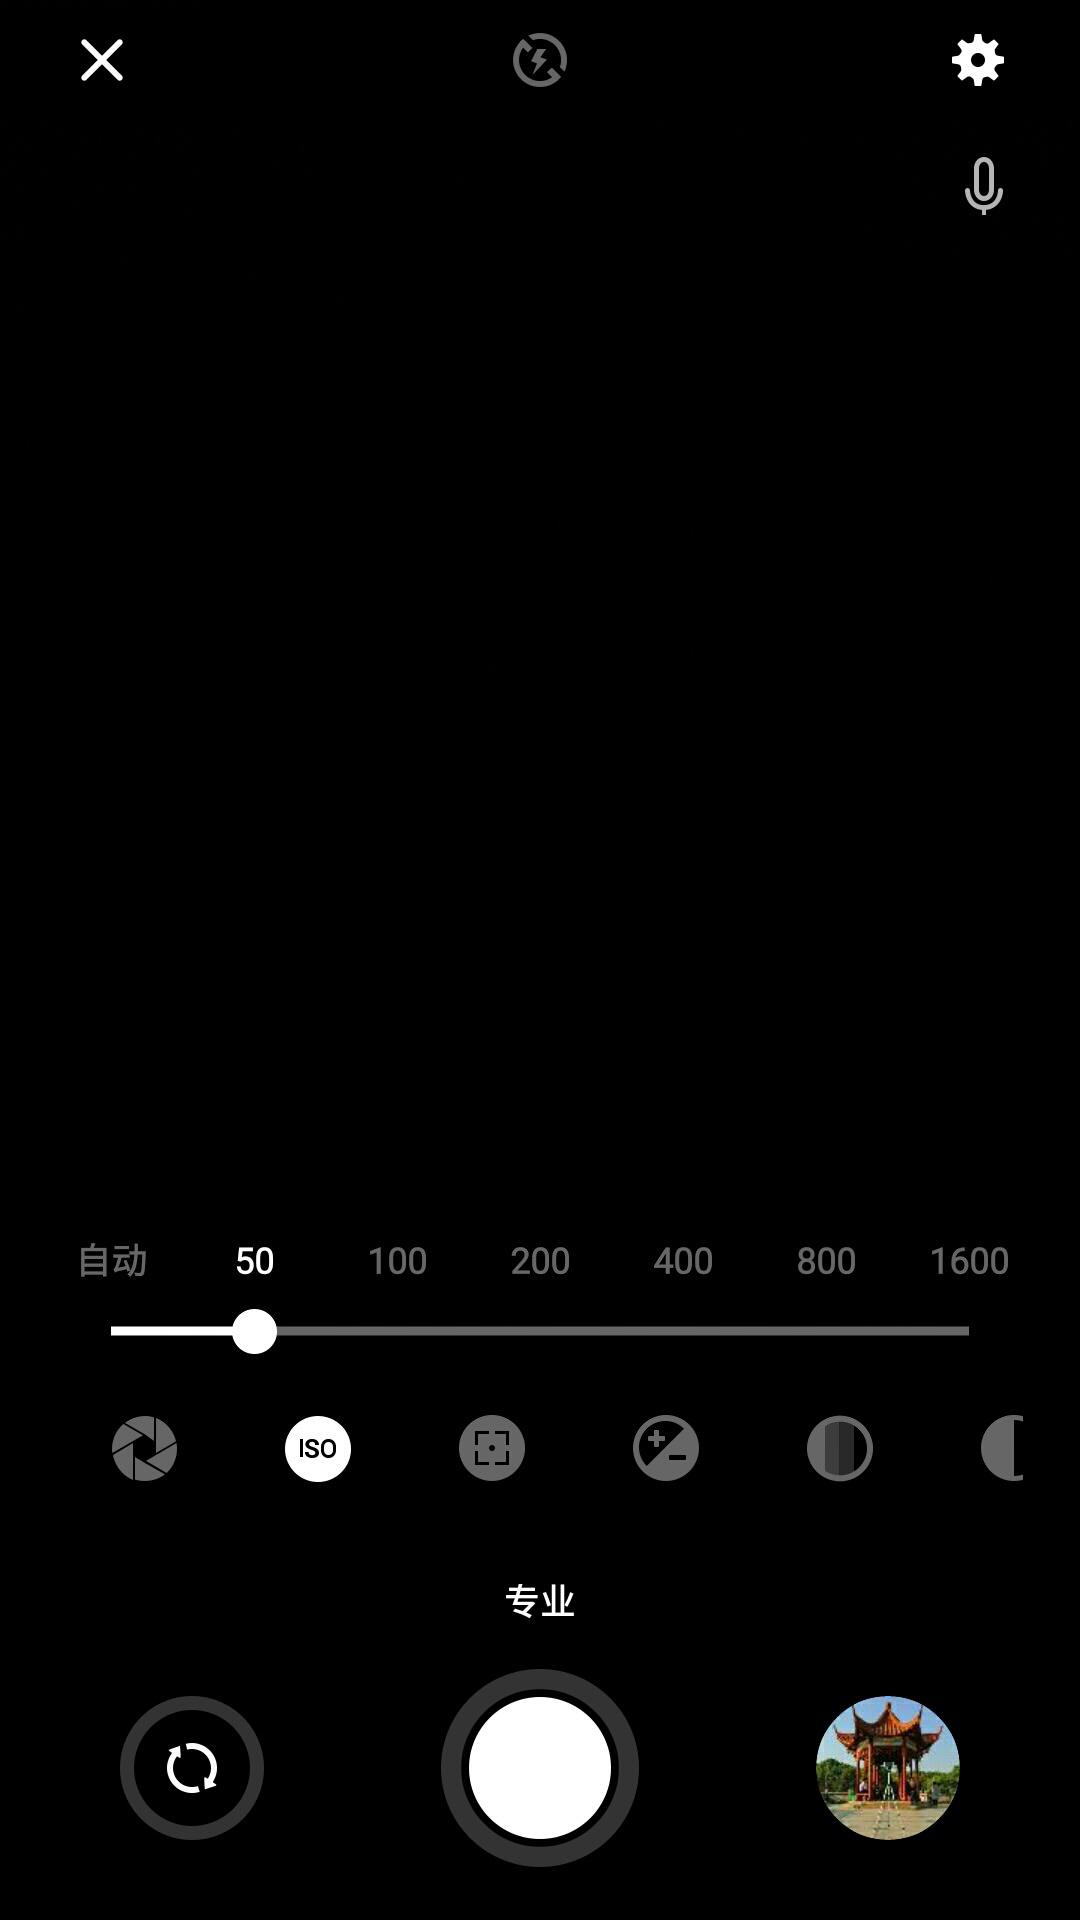 S61209-170837.jpg